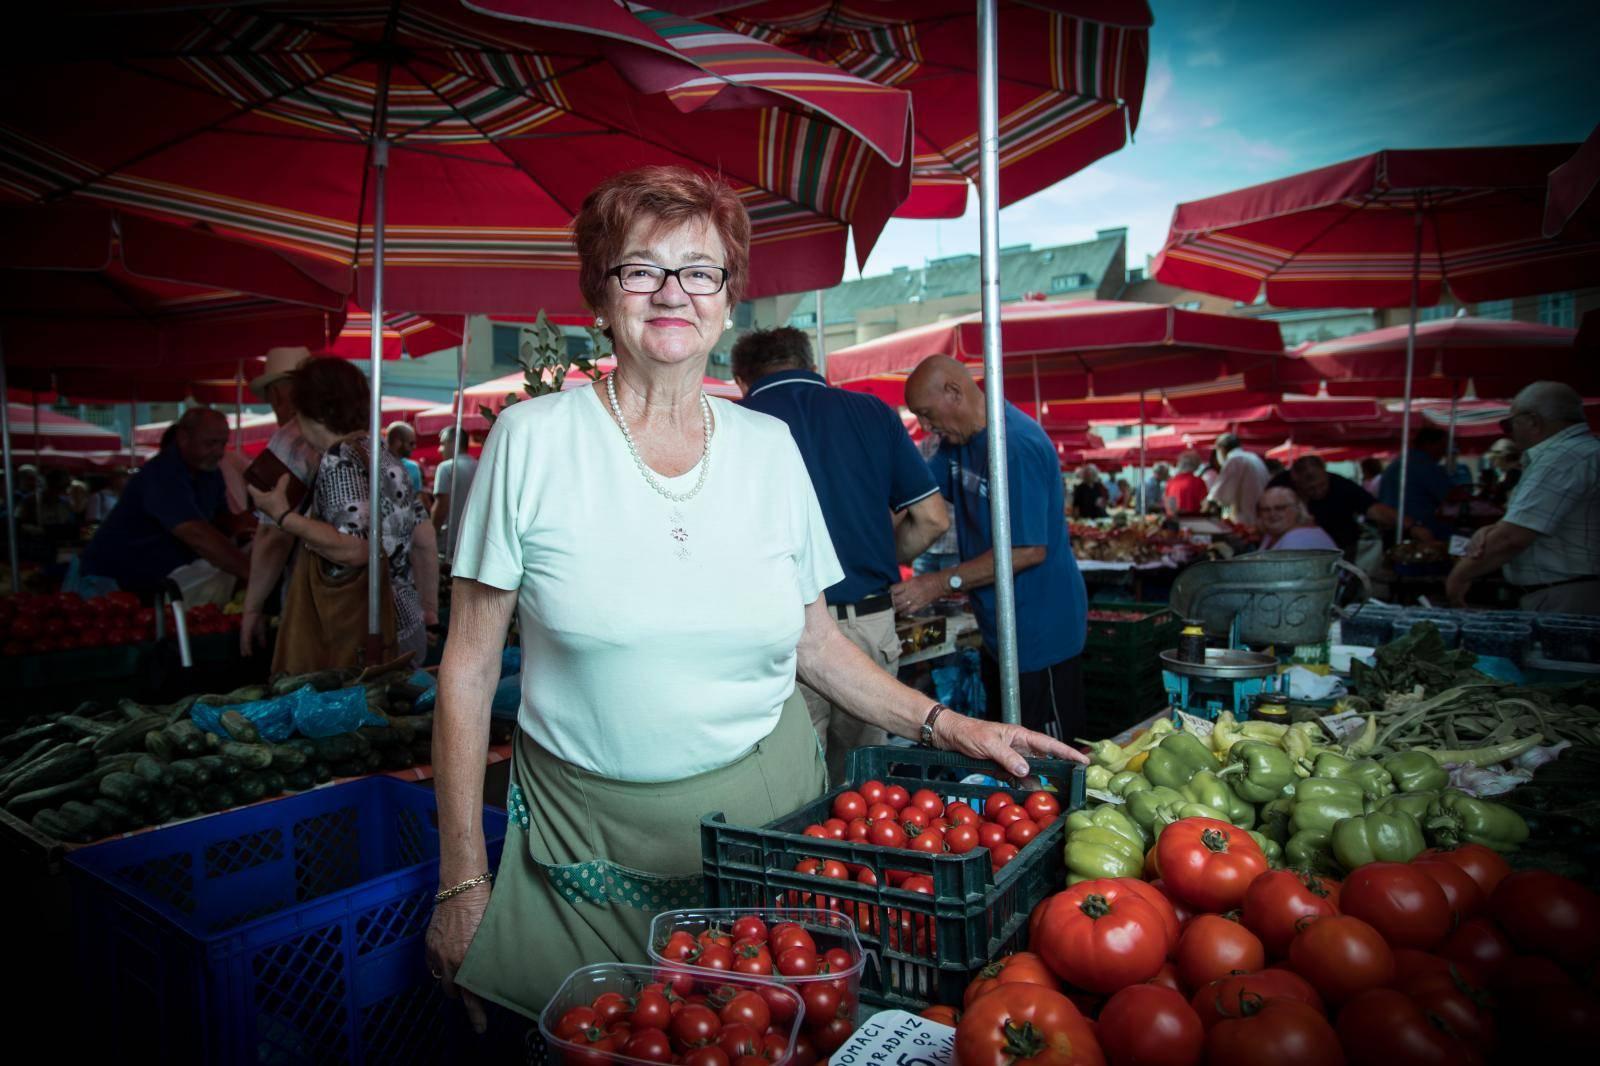 Ivanka je miss Dolca: 'Zrihtam' se svaki dan za odlazak na plac